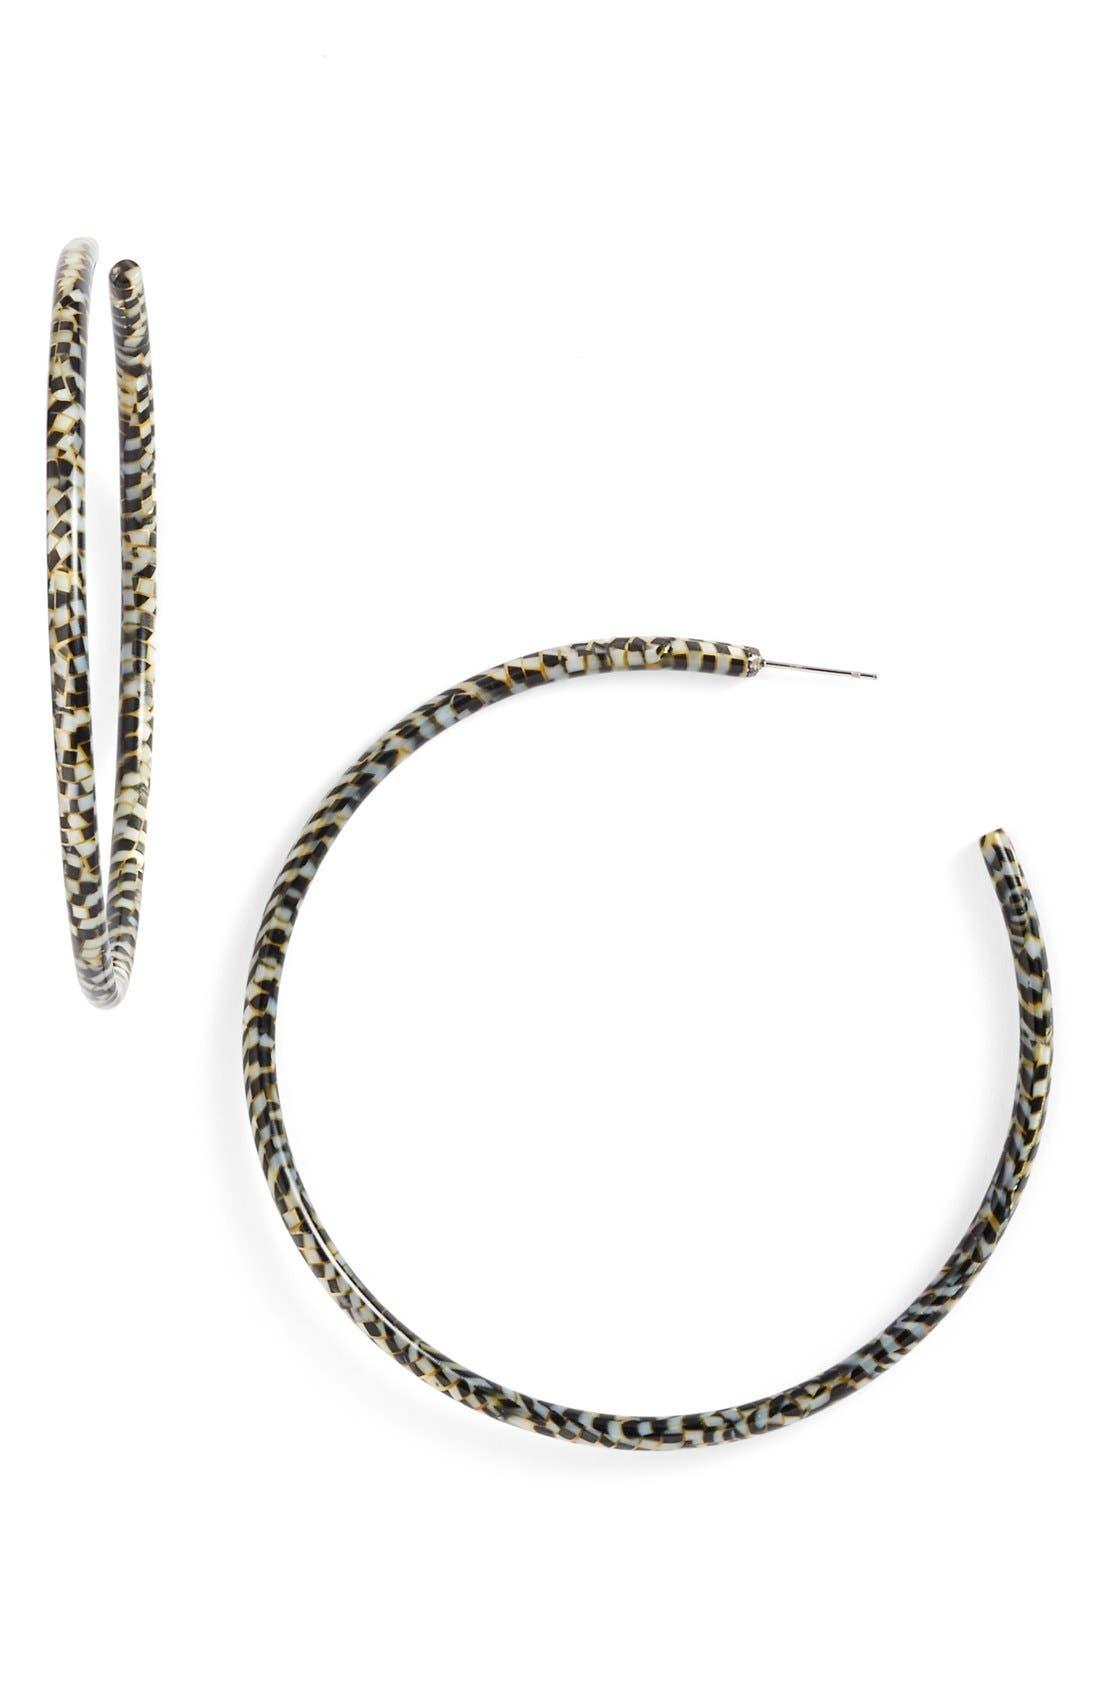 L Erickson 'Jumbo' Hoop Earrings,                             Main thumbnail 1, color,                             Opera Silver